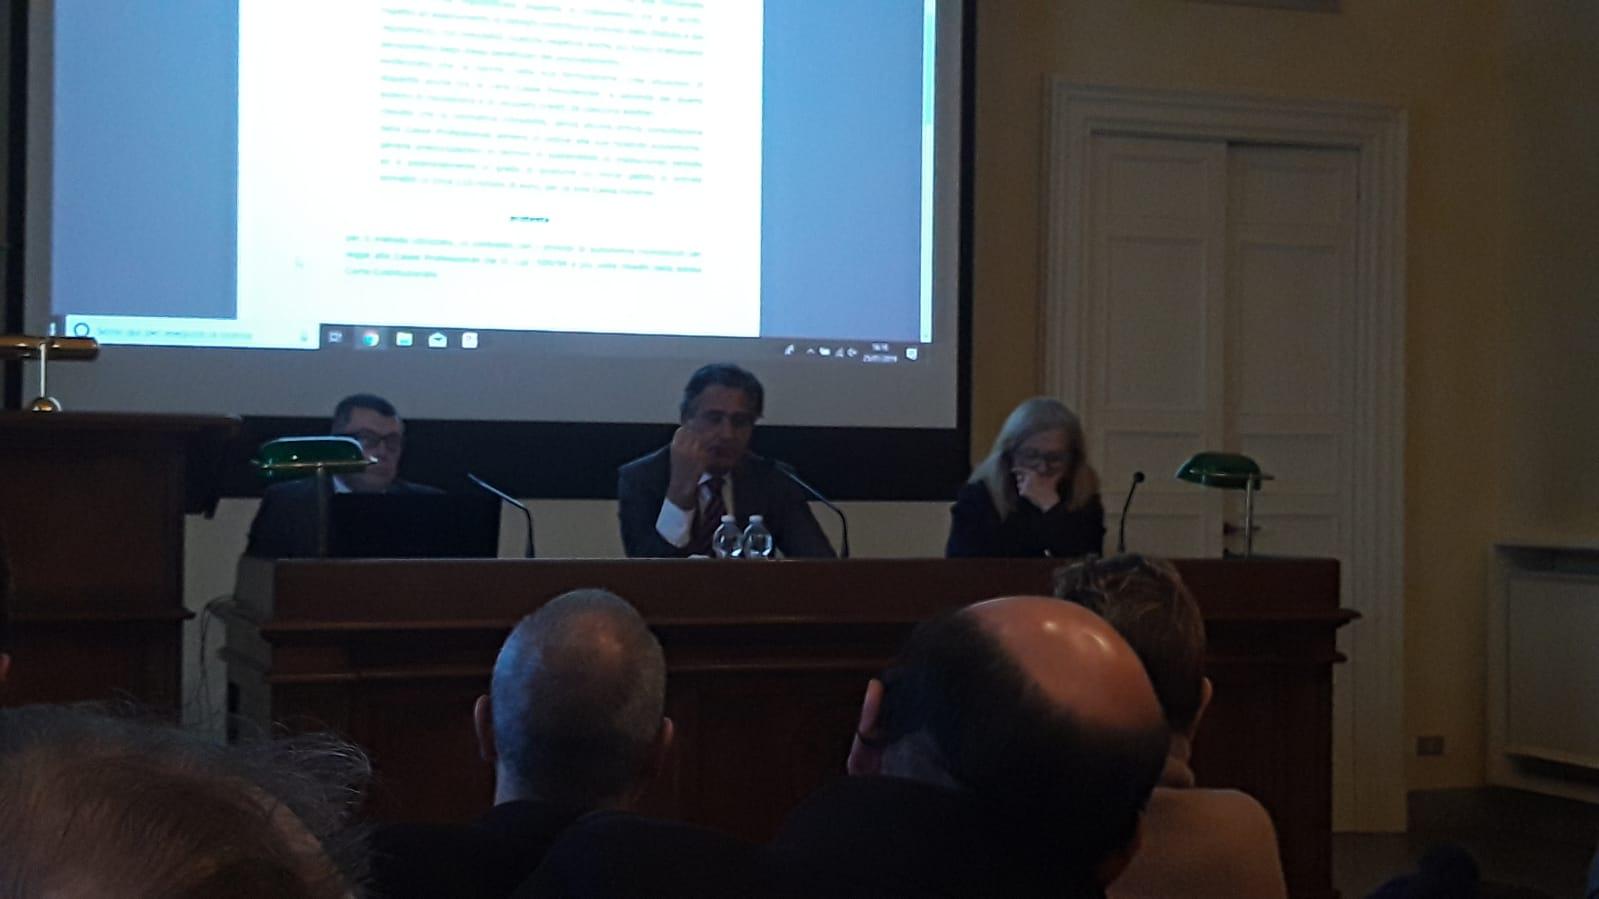 Convegno ordine avvocati pavia Girolamo De Rada